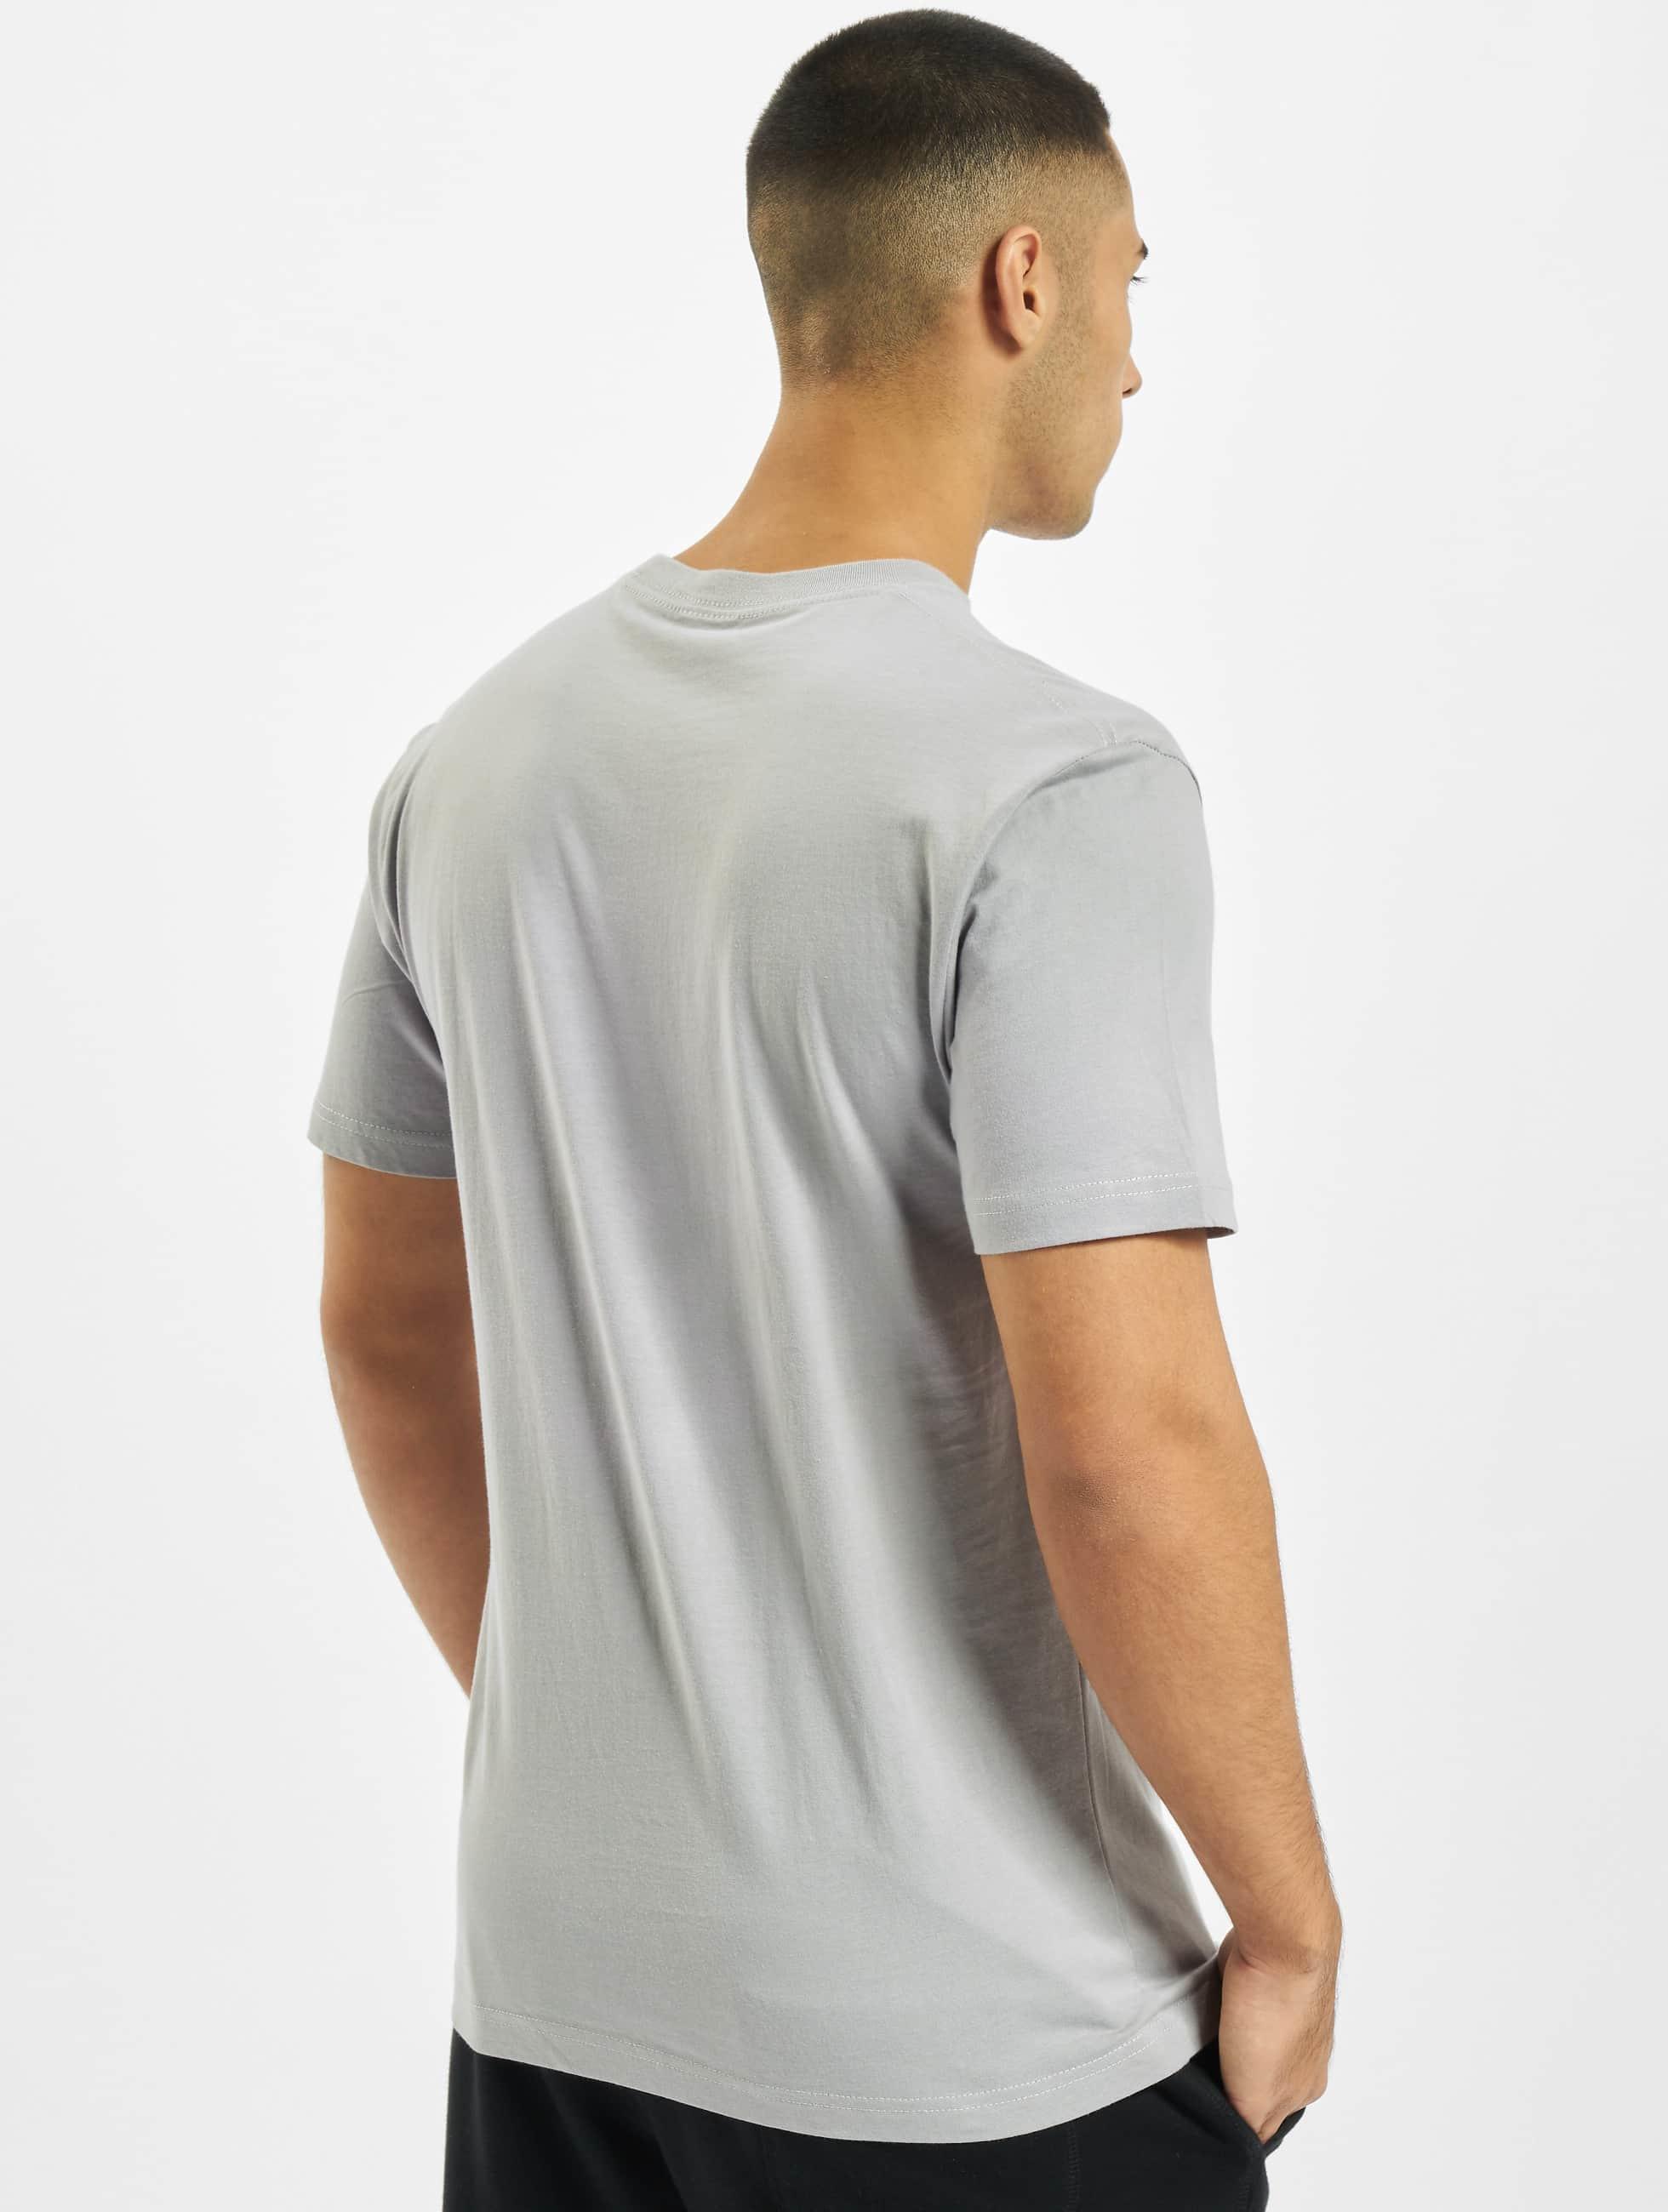 Yums t-shirt Sew Up Game grijs